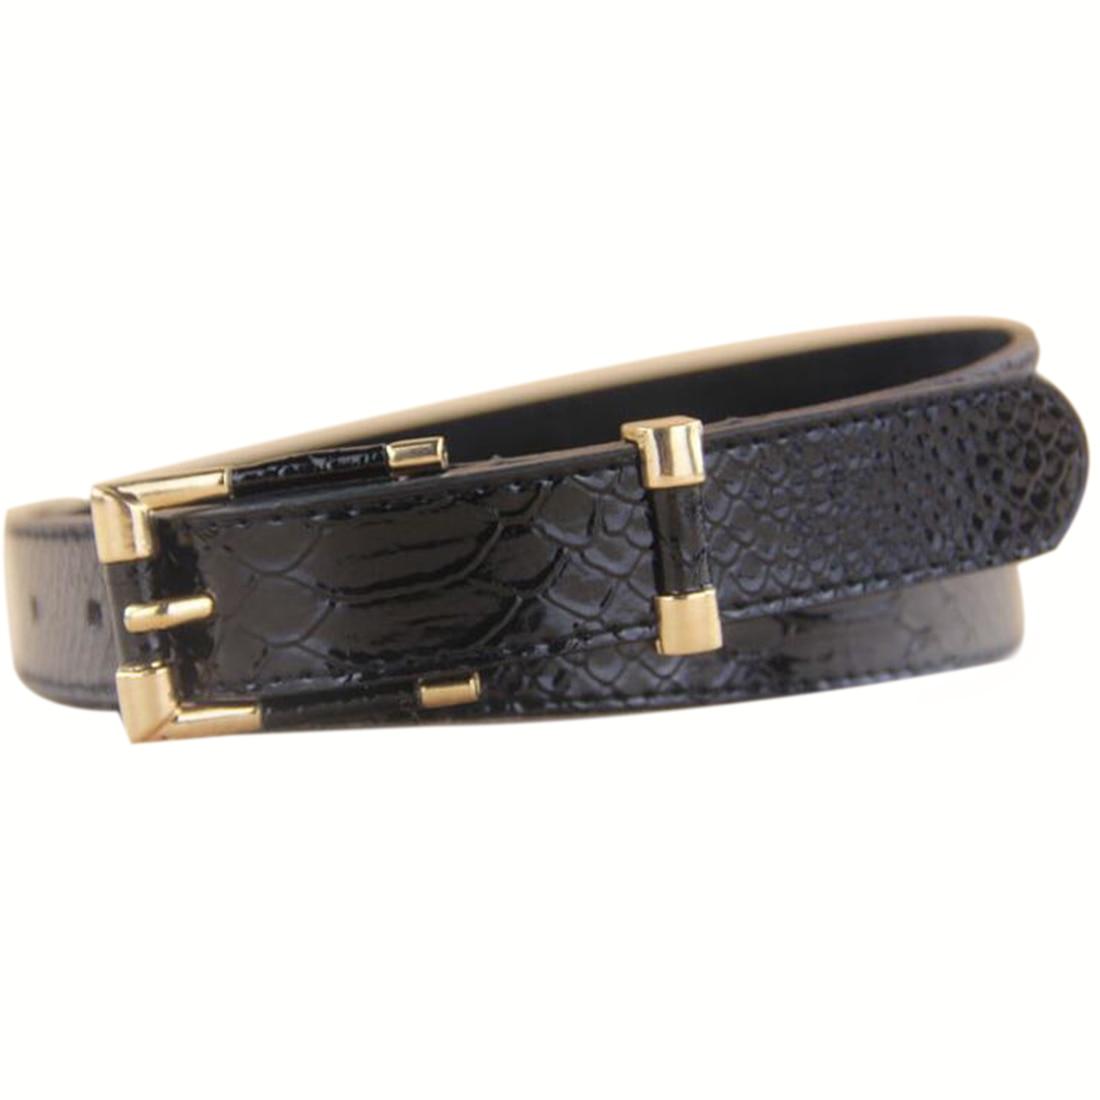 JIMMYHANK Women Belts Crocodile Punk Thin Waist Belt Black Red Trench Female Genuine Leather Strap Buckle Waistband